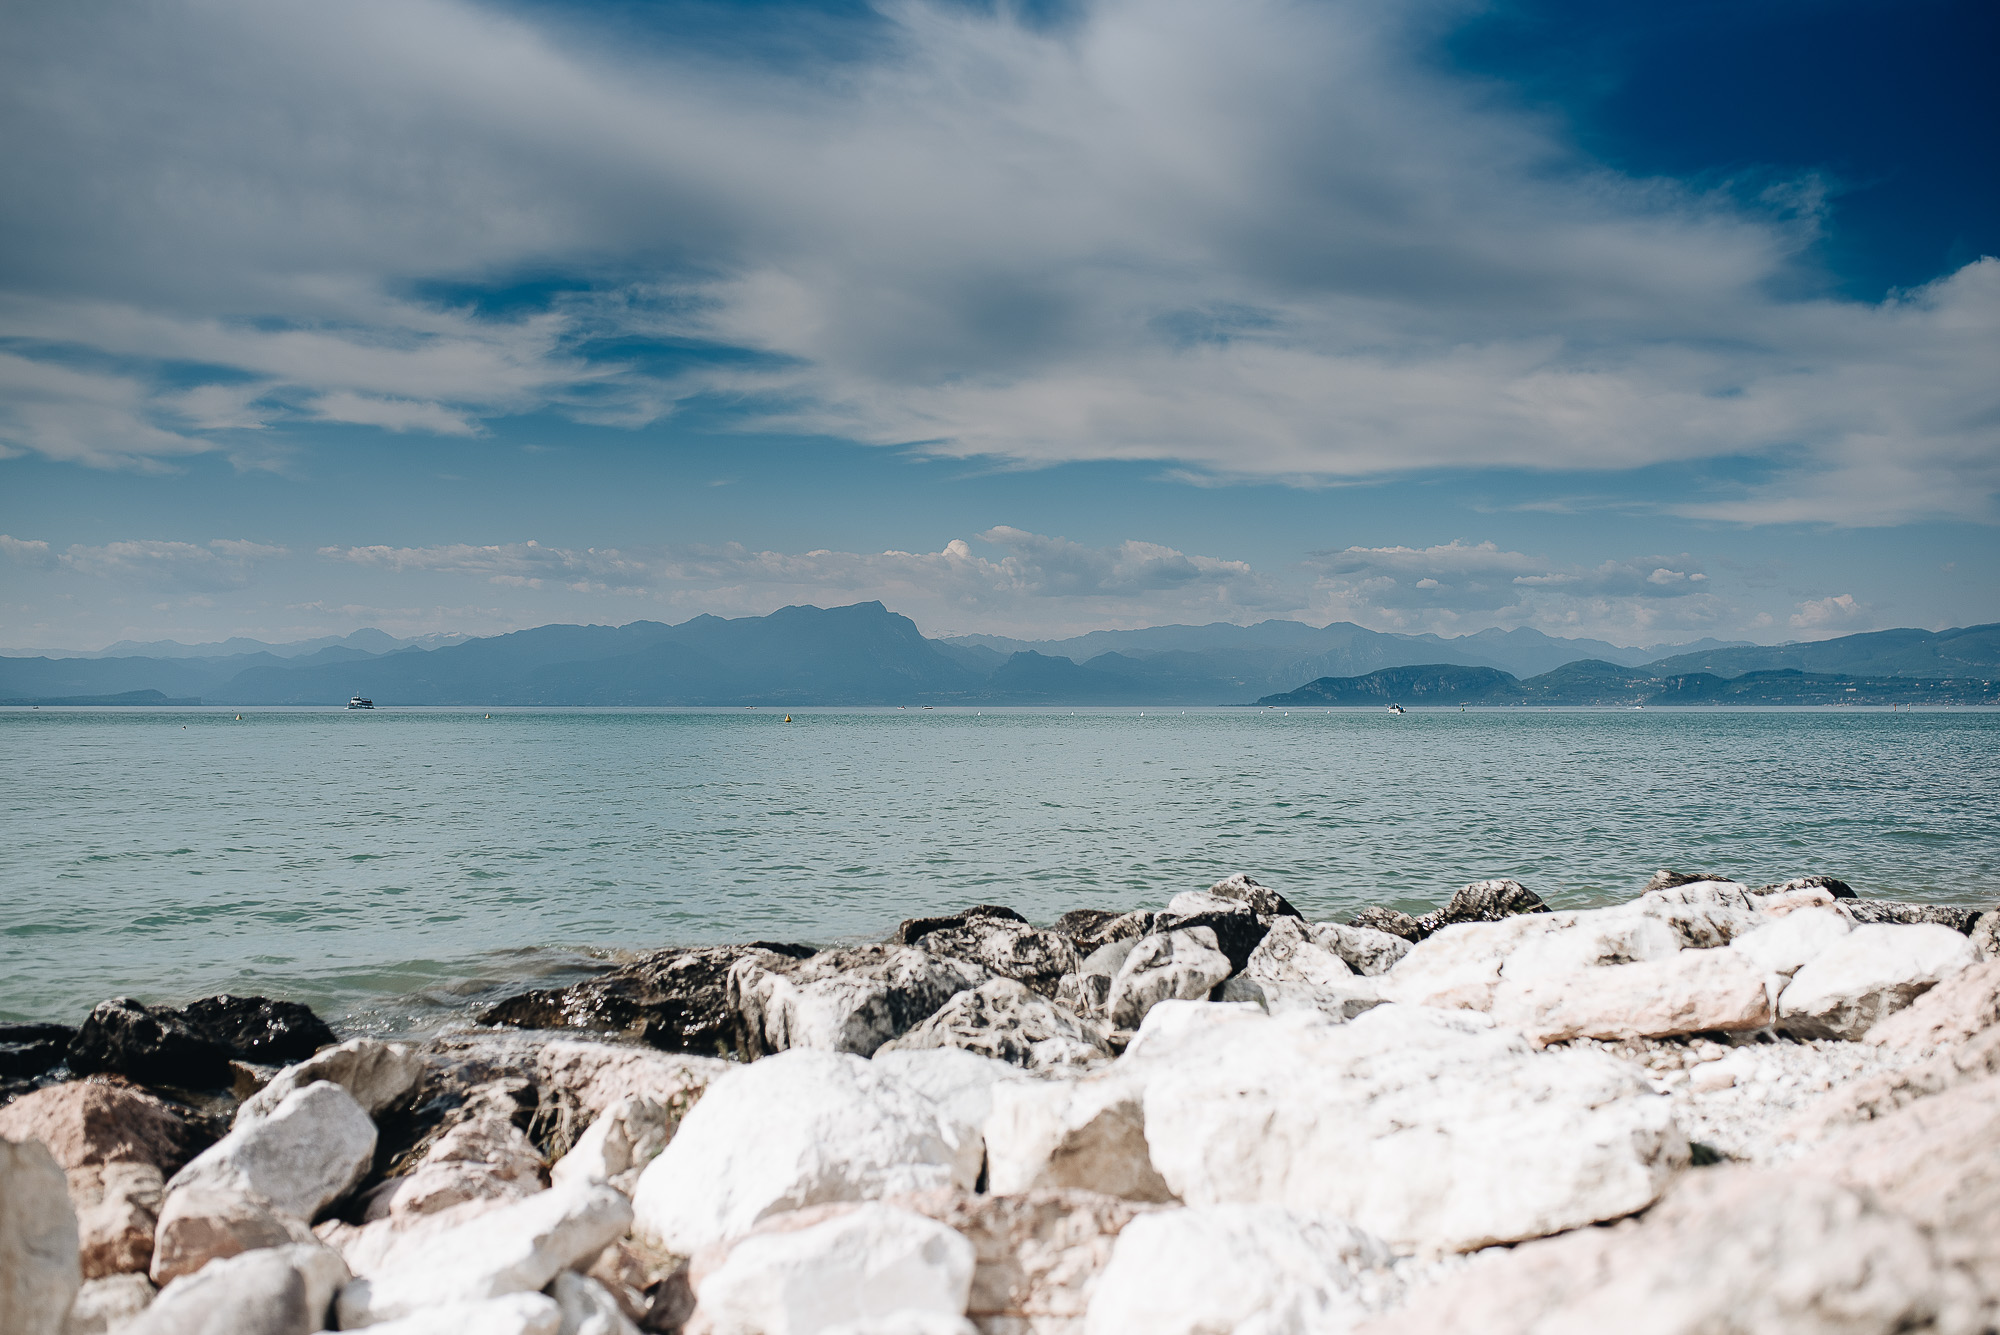 OurBeautifulAdventure-LakeGarda-Italy-Blog-1755.jpg